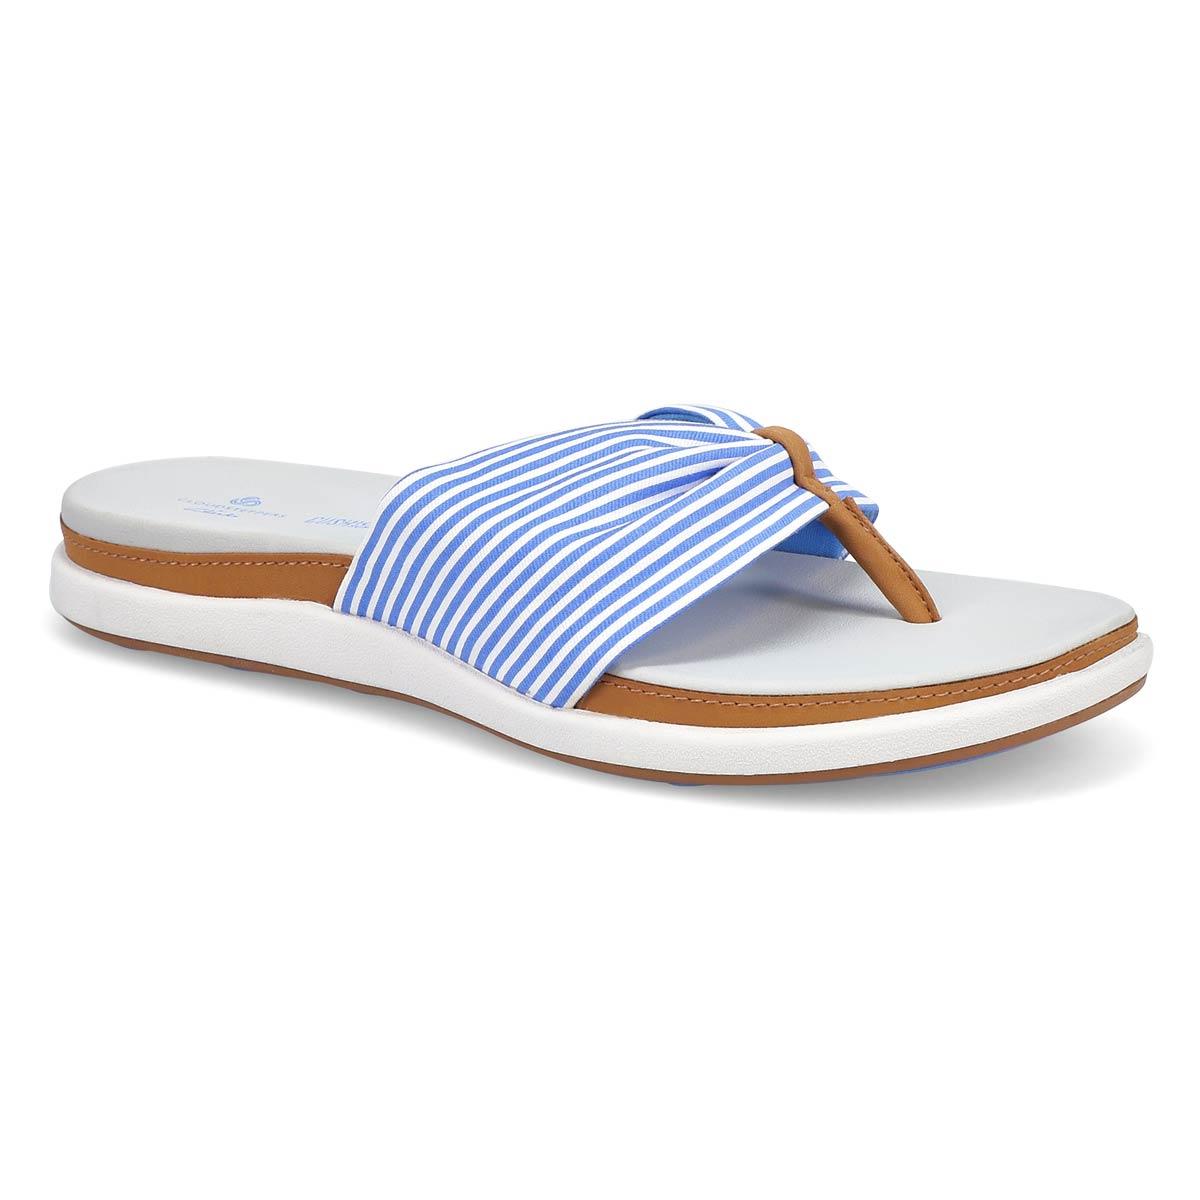 Women's Eliza June Flip Flop - Blue/White